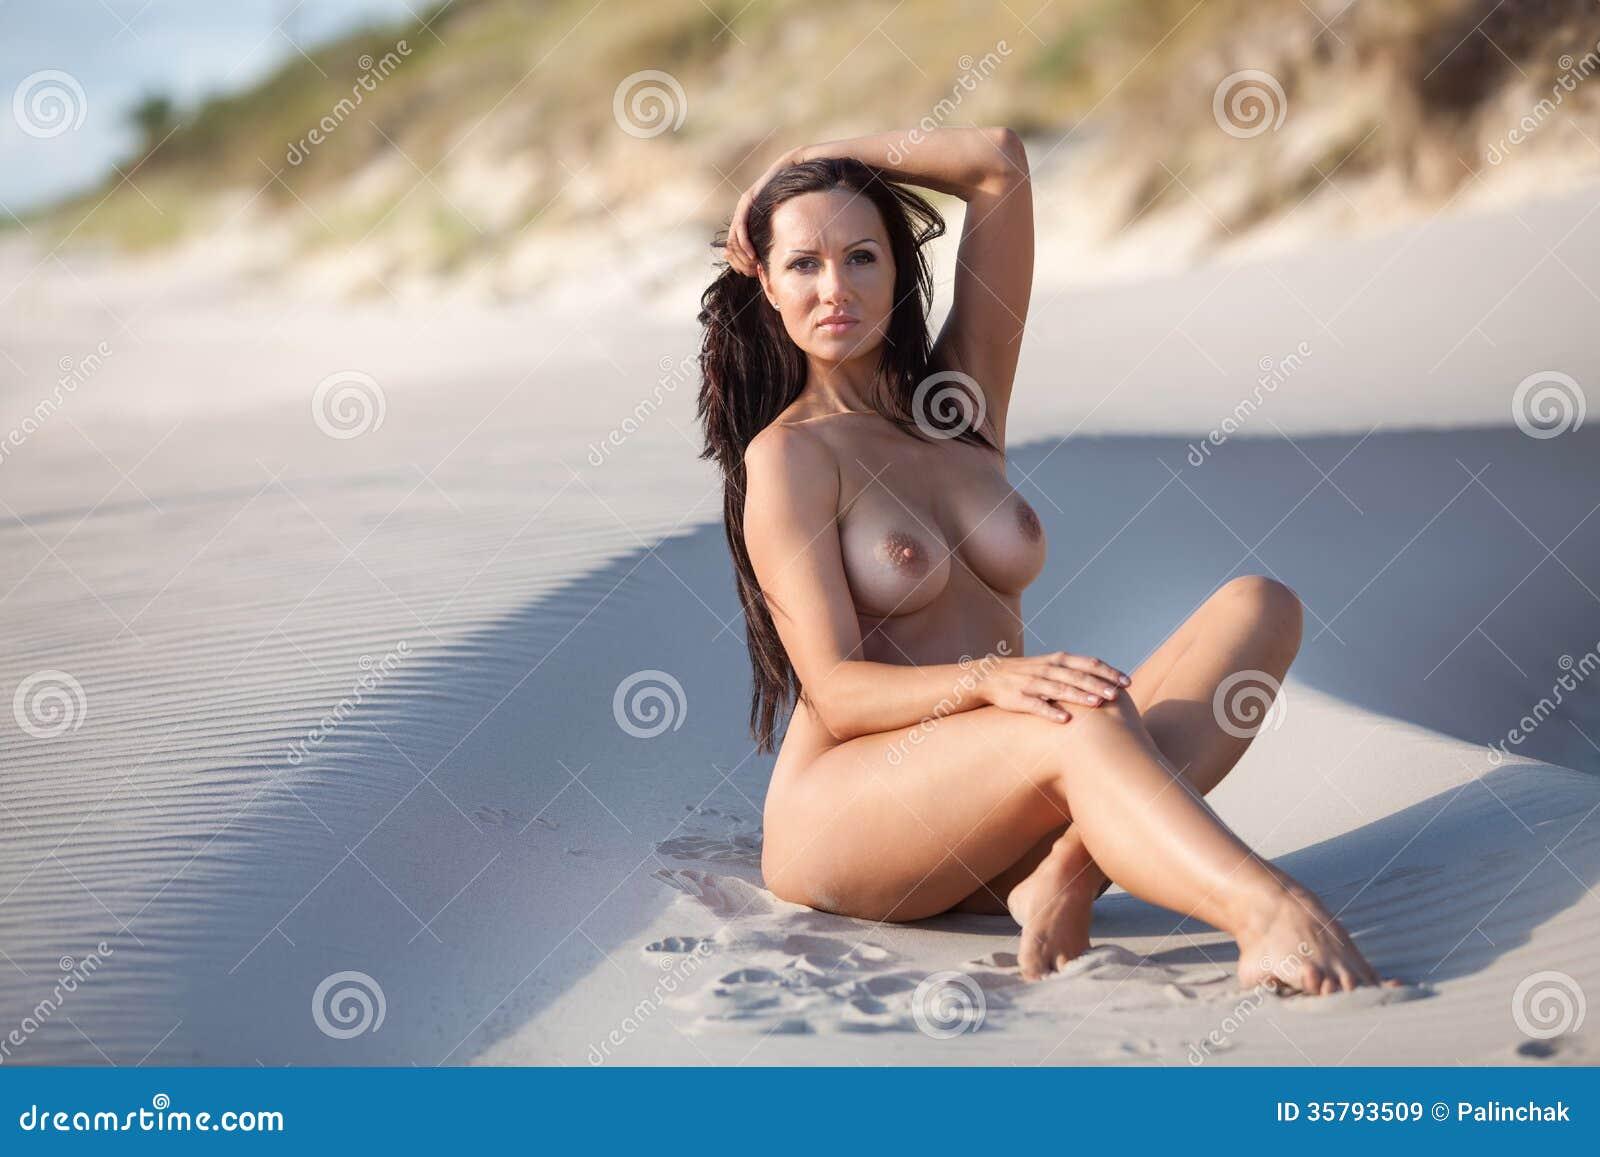 Share Sandy nude pics